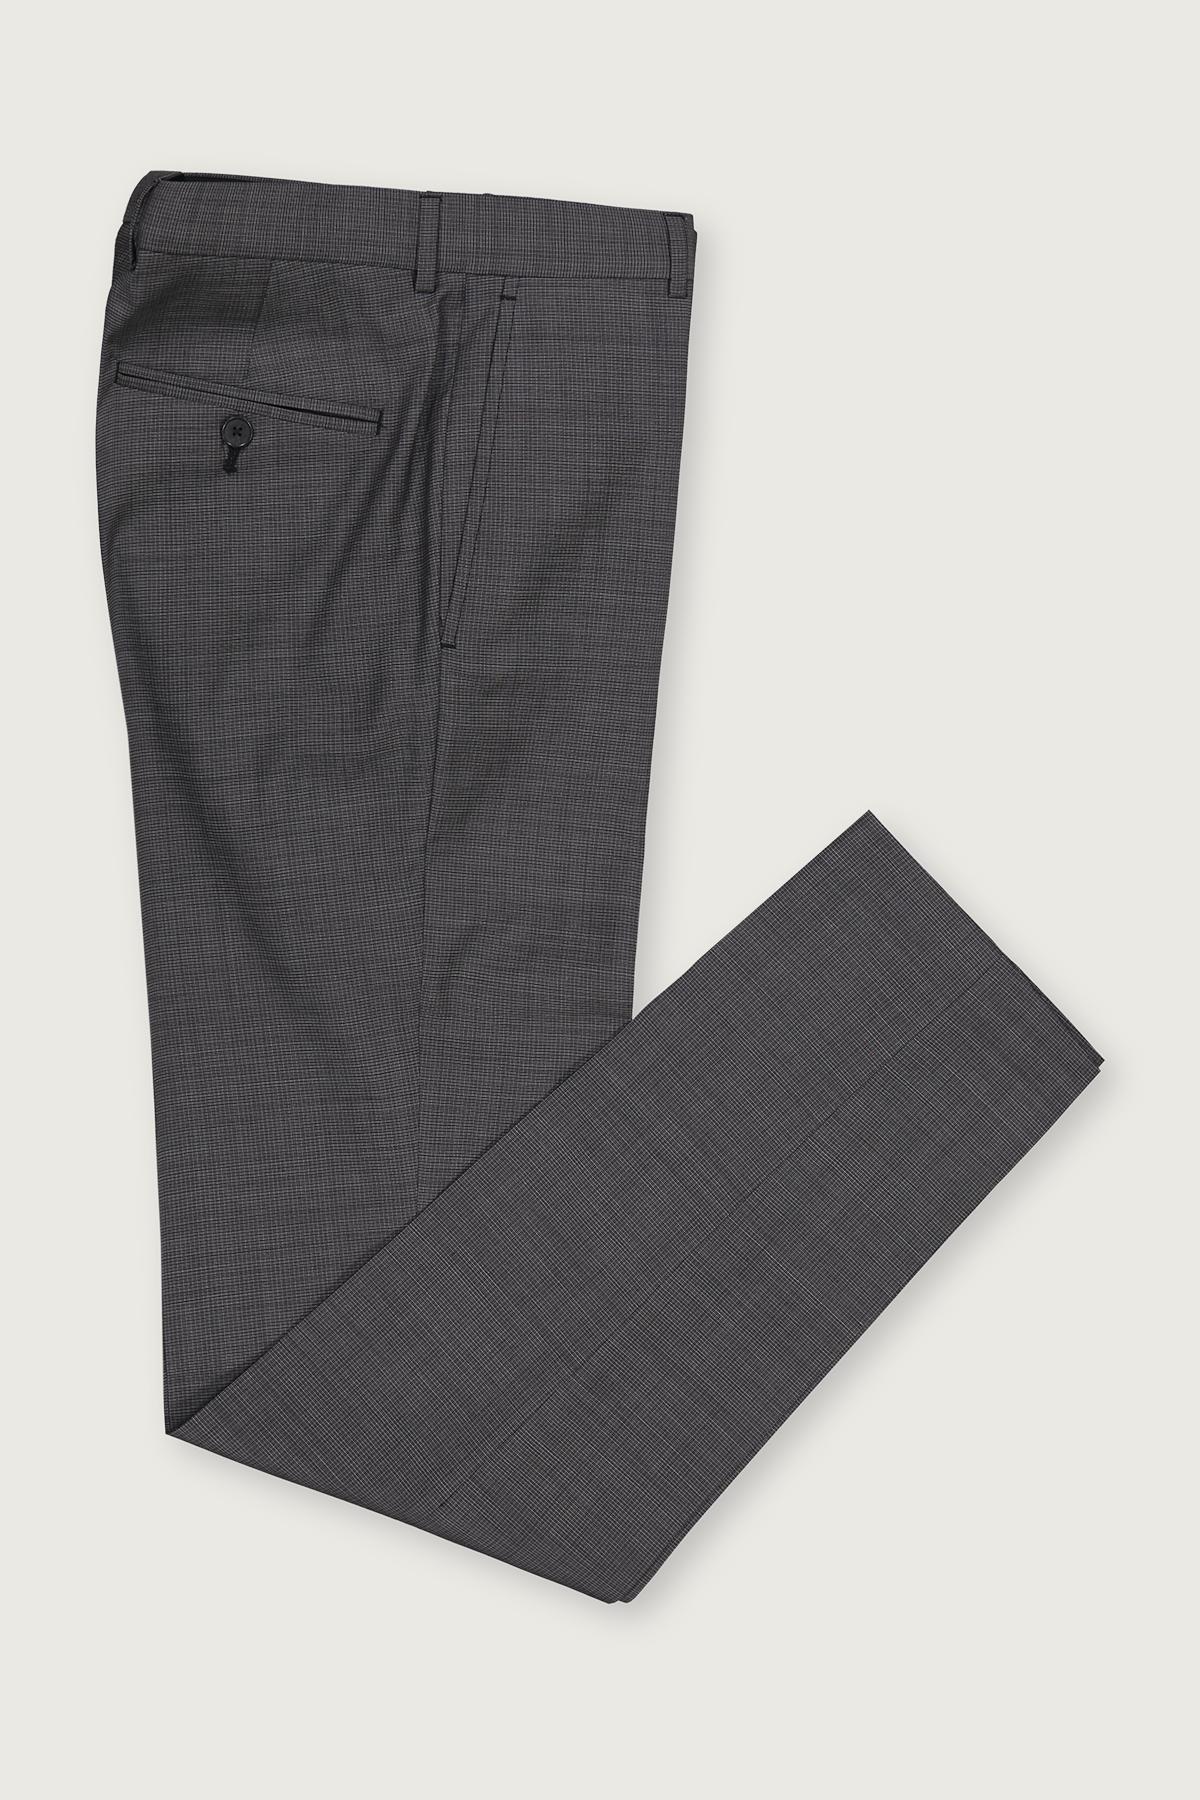 Pantalon Vestir High Life Con Tejido 100 Lana Gris Corte Slim Para Caballero Pantalon Para Hombres Men S Fashion